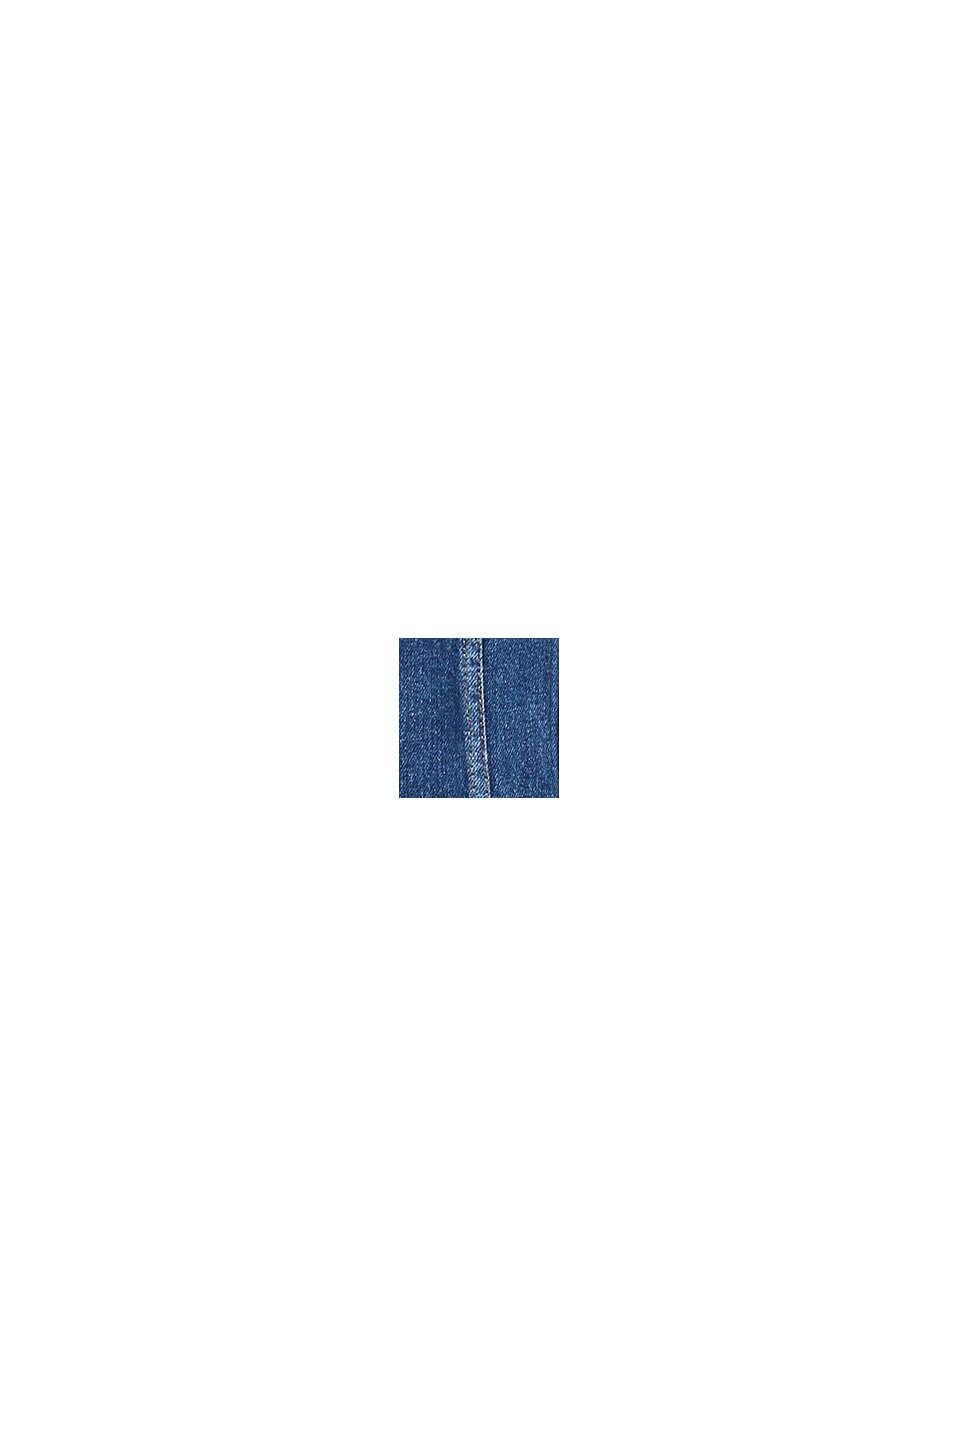 Denim jacket with stretch for comfort, BLUE DARK WASHED, swatch